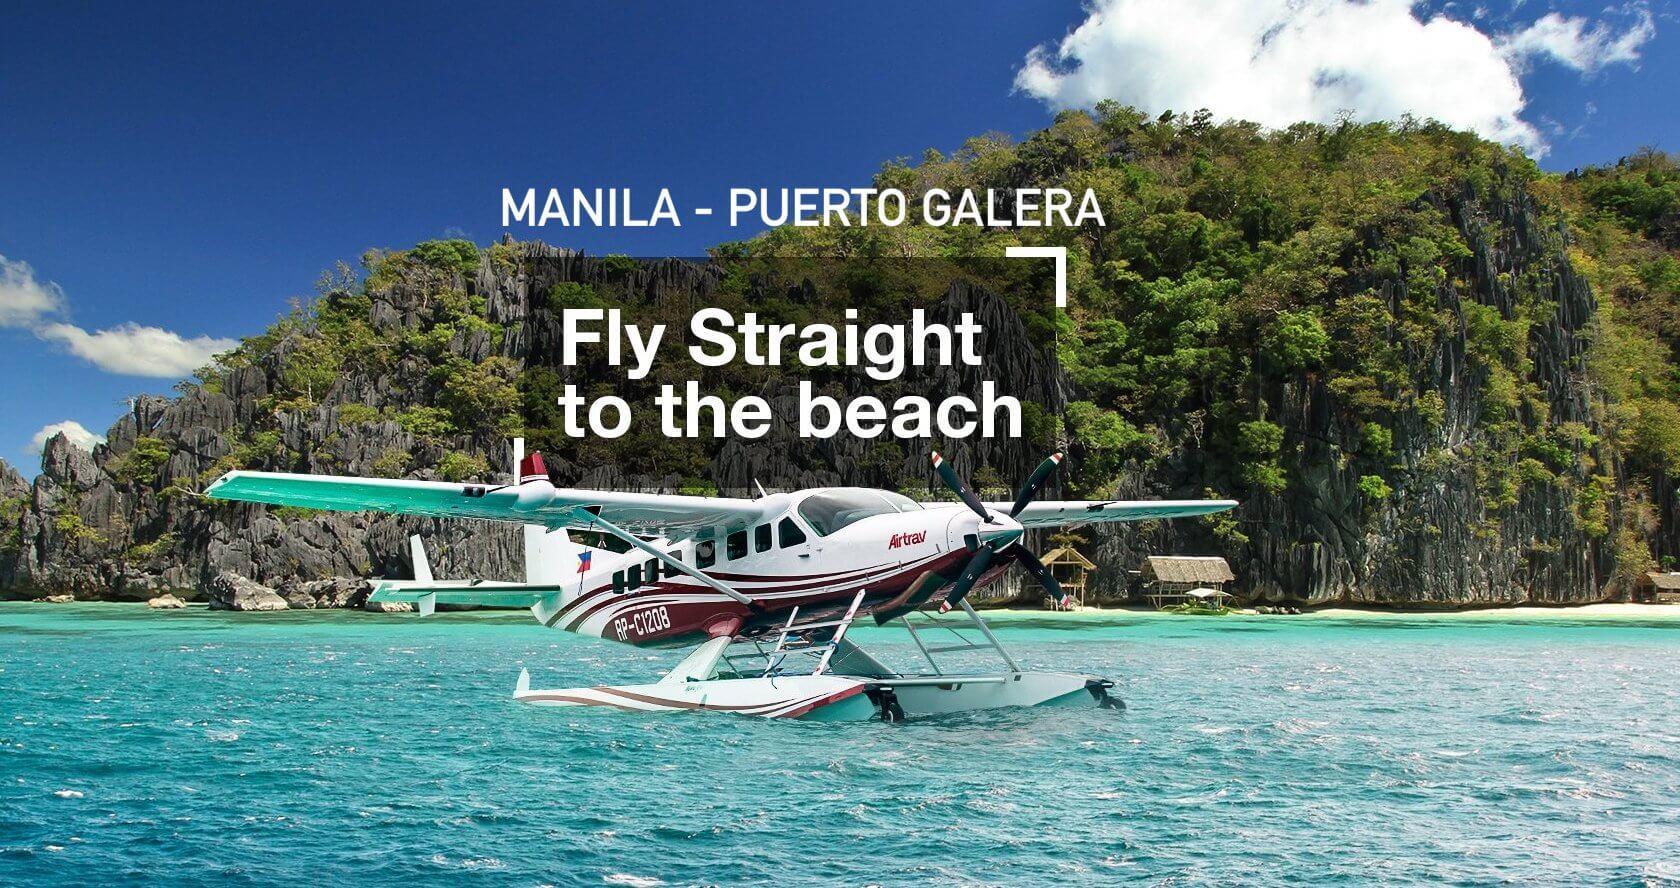 AirTrav Wasserflugzeug Flug Manila - Puerto Galera